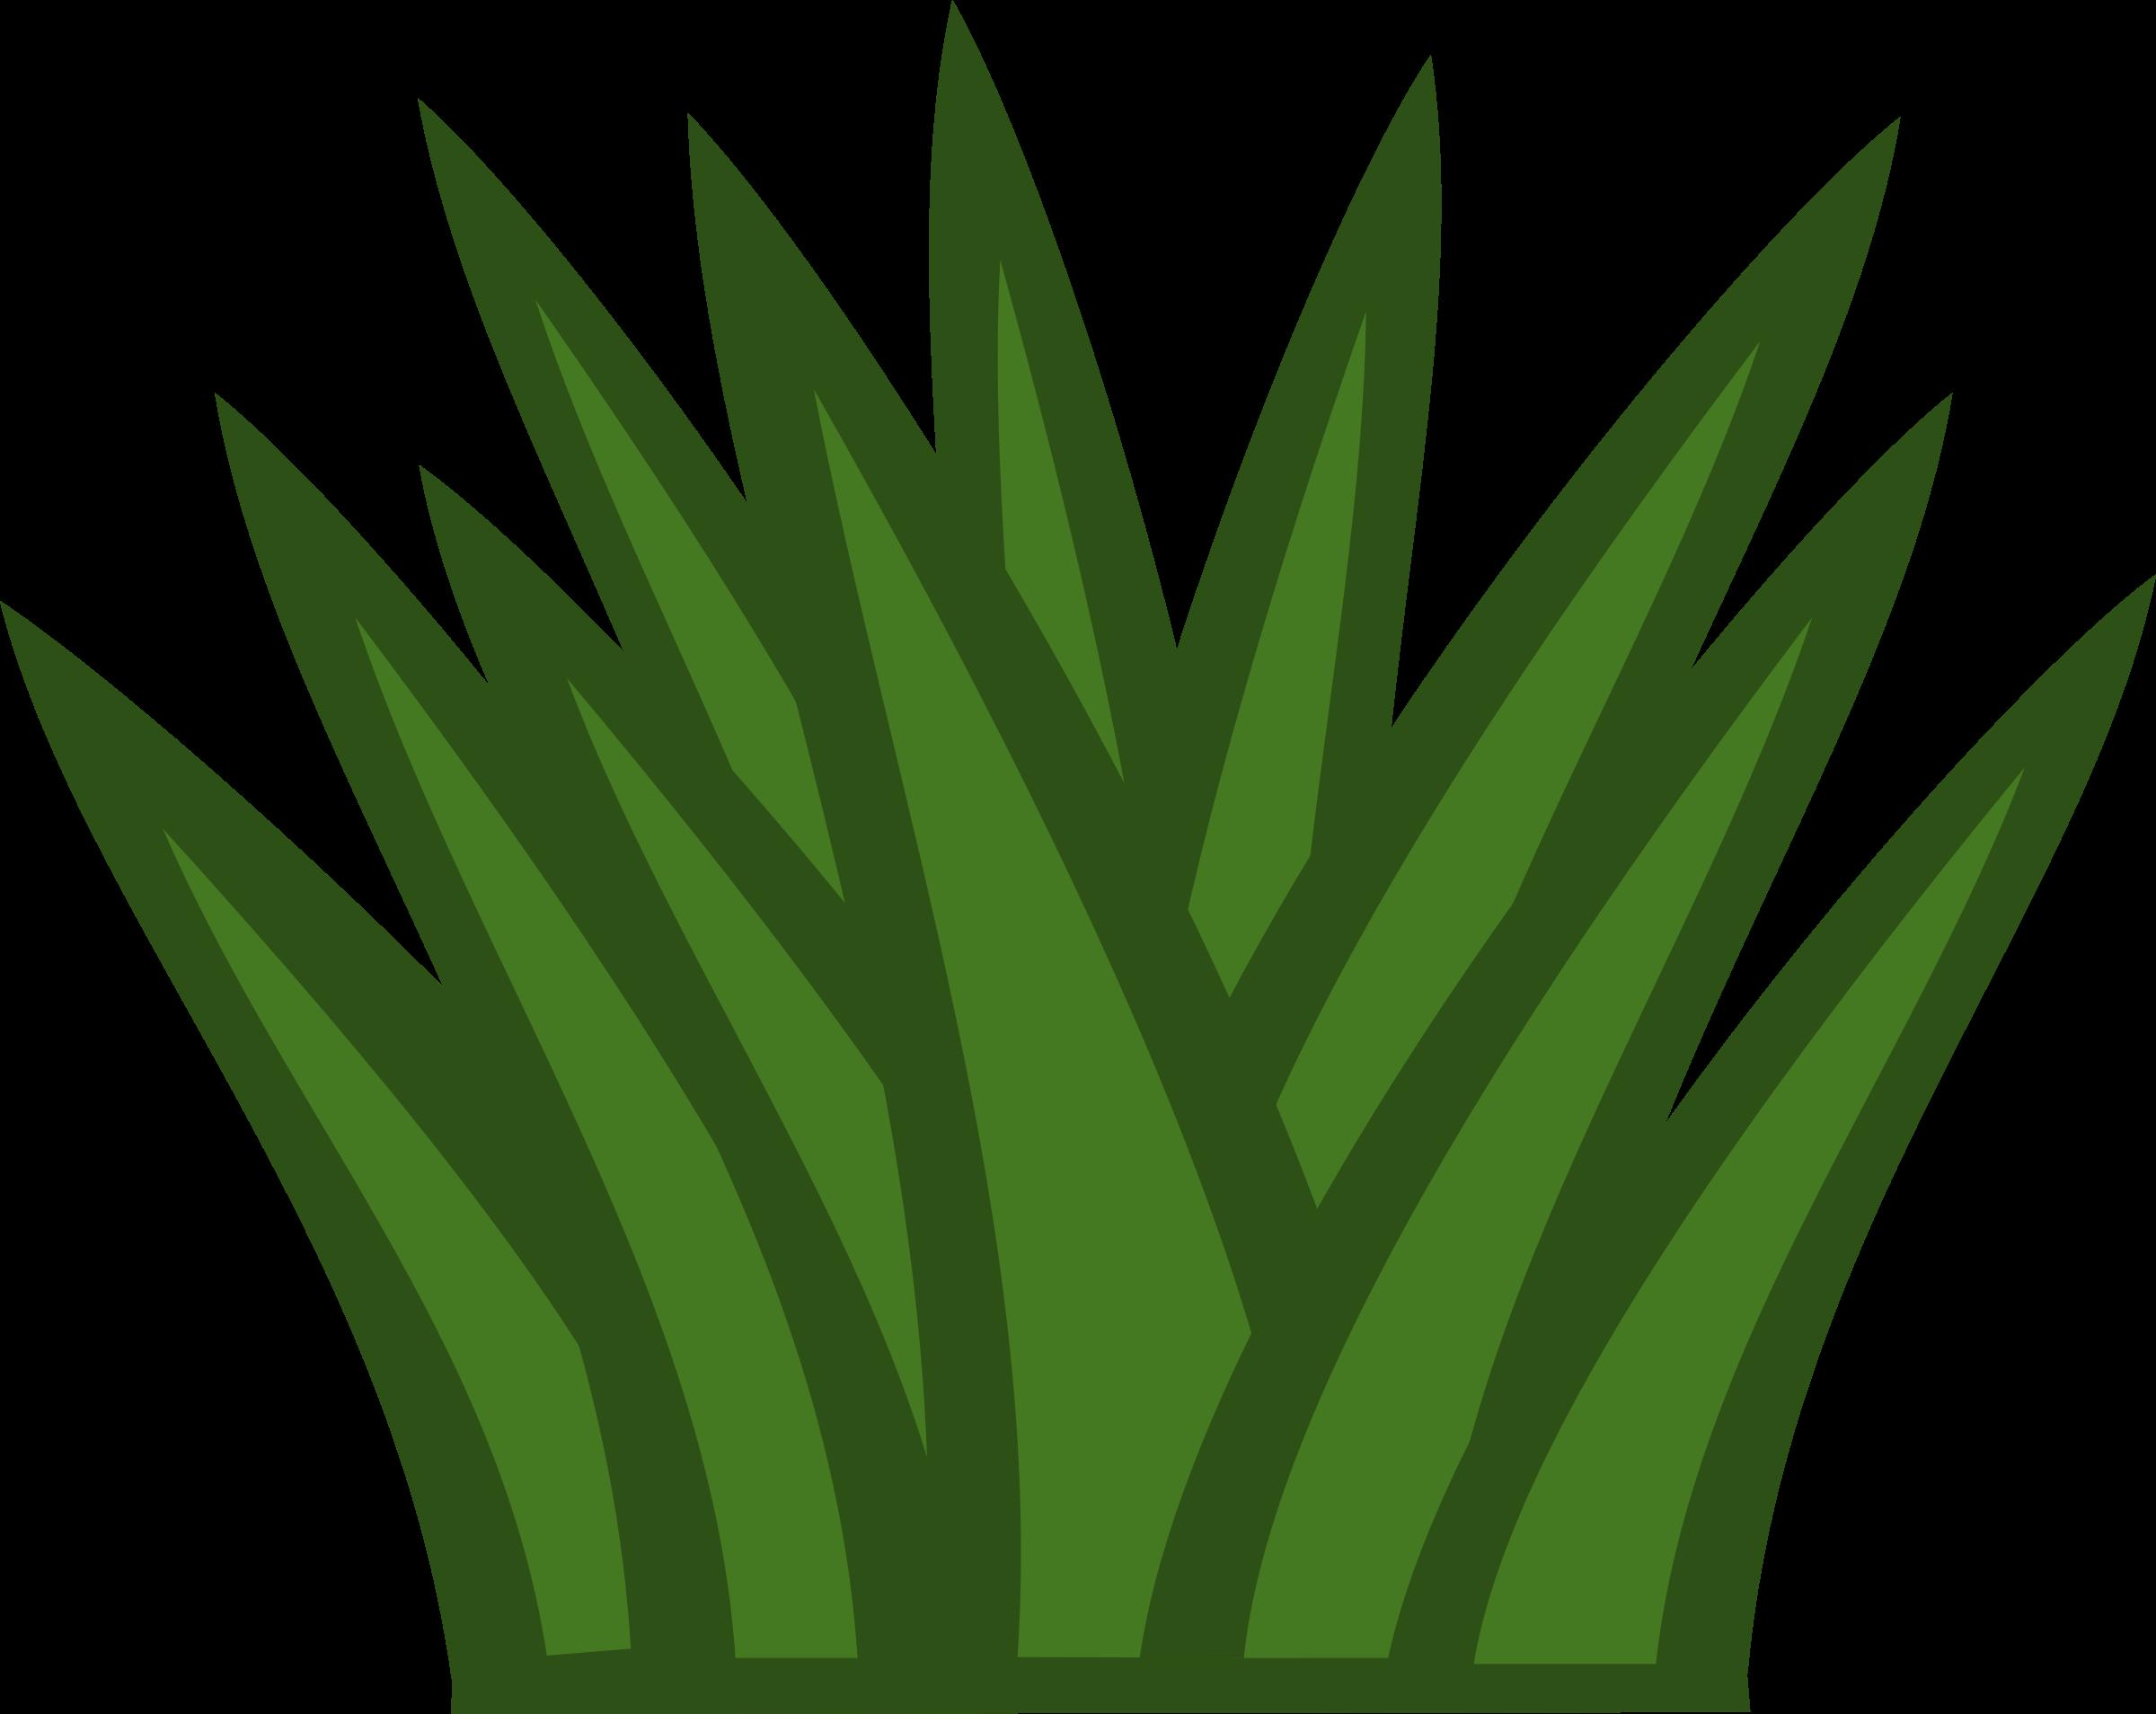 Clipart grass shrub. Cactus big image png